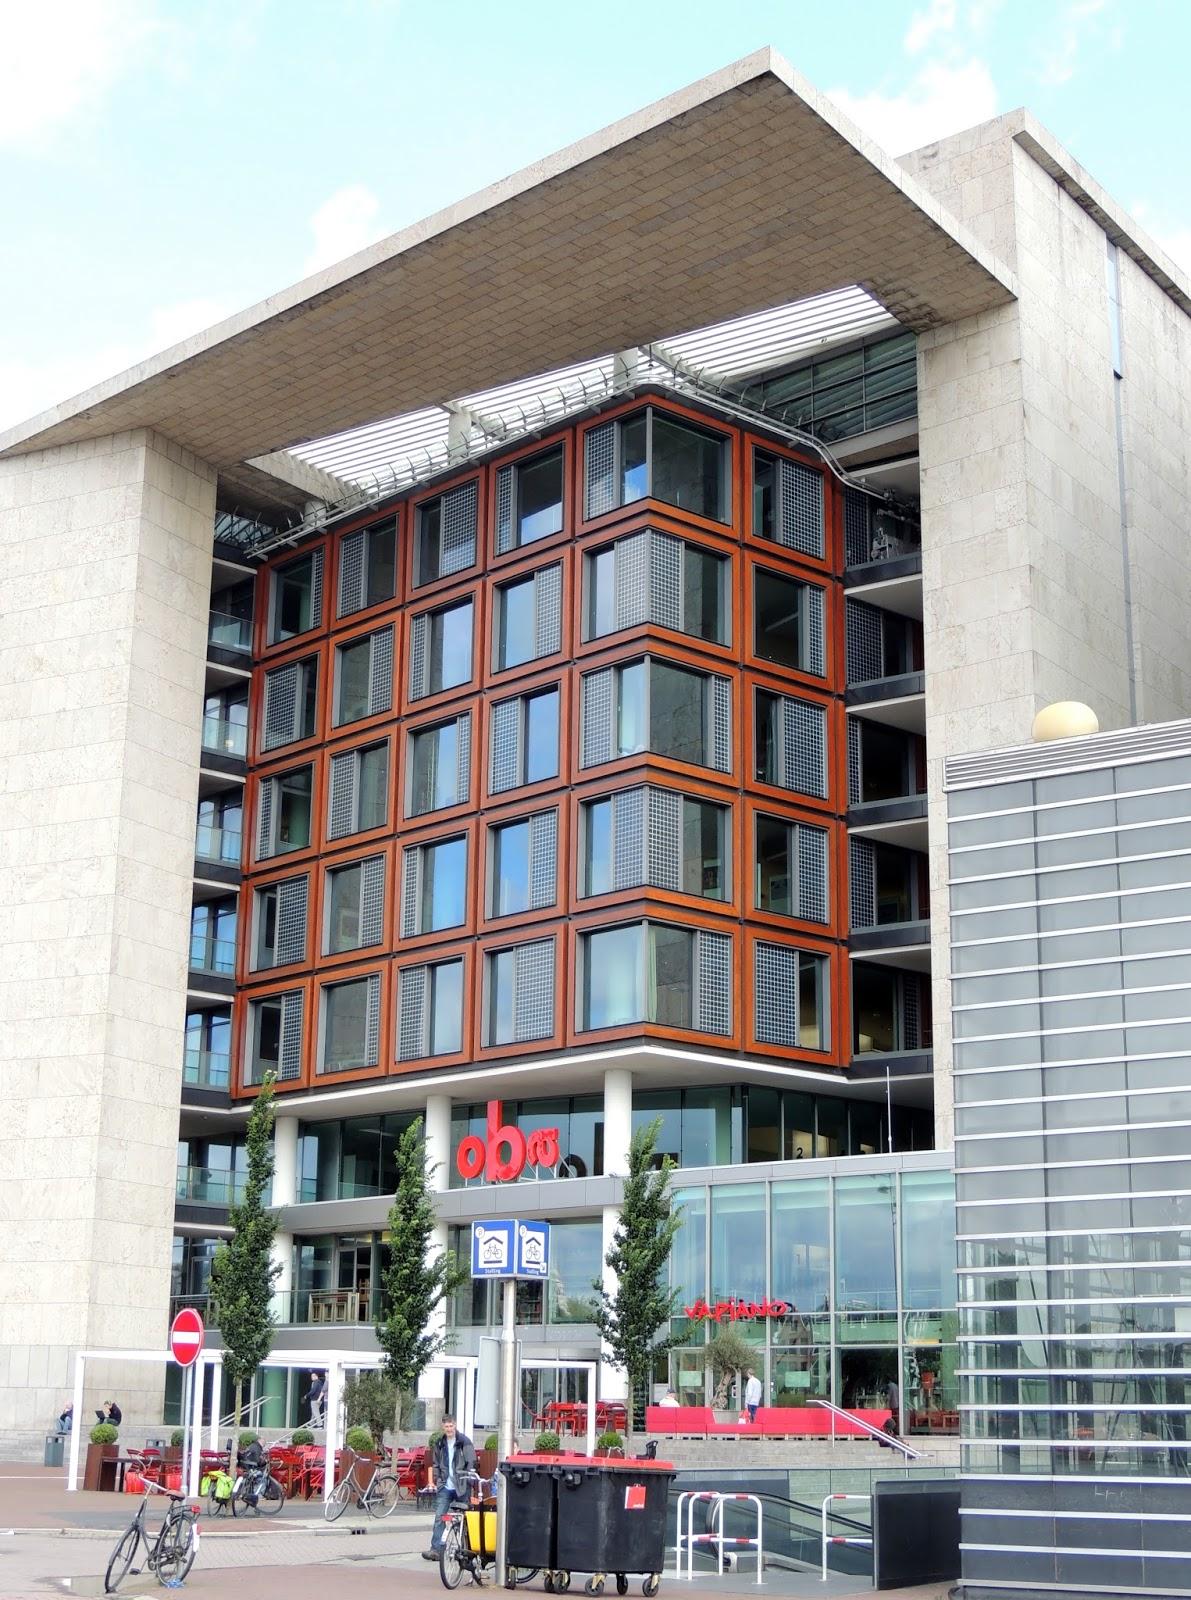 Oba openbare bibliotheek amsterdam ca adores de for Bibliotheek amsterdam